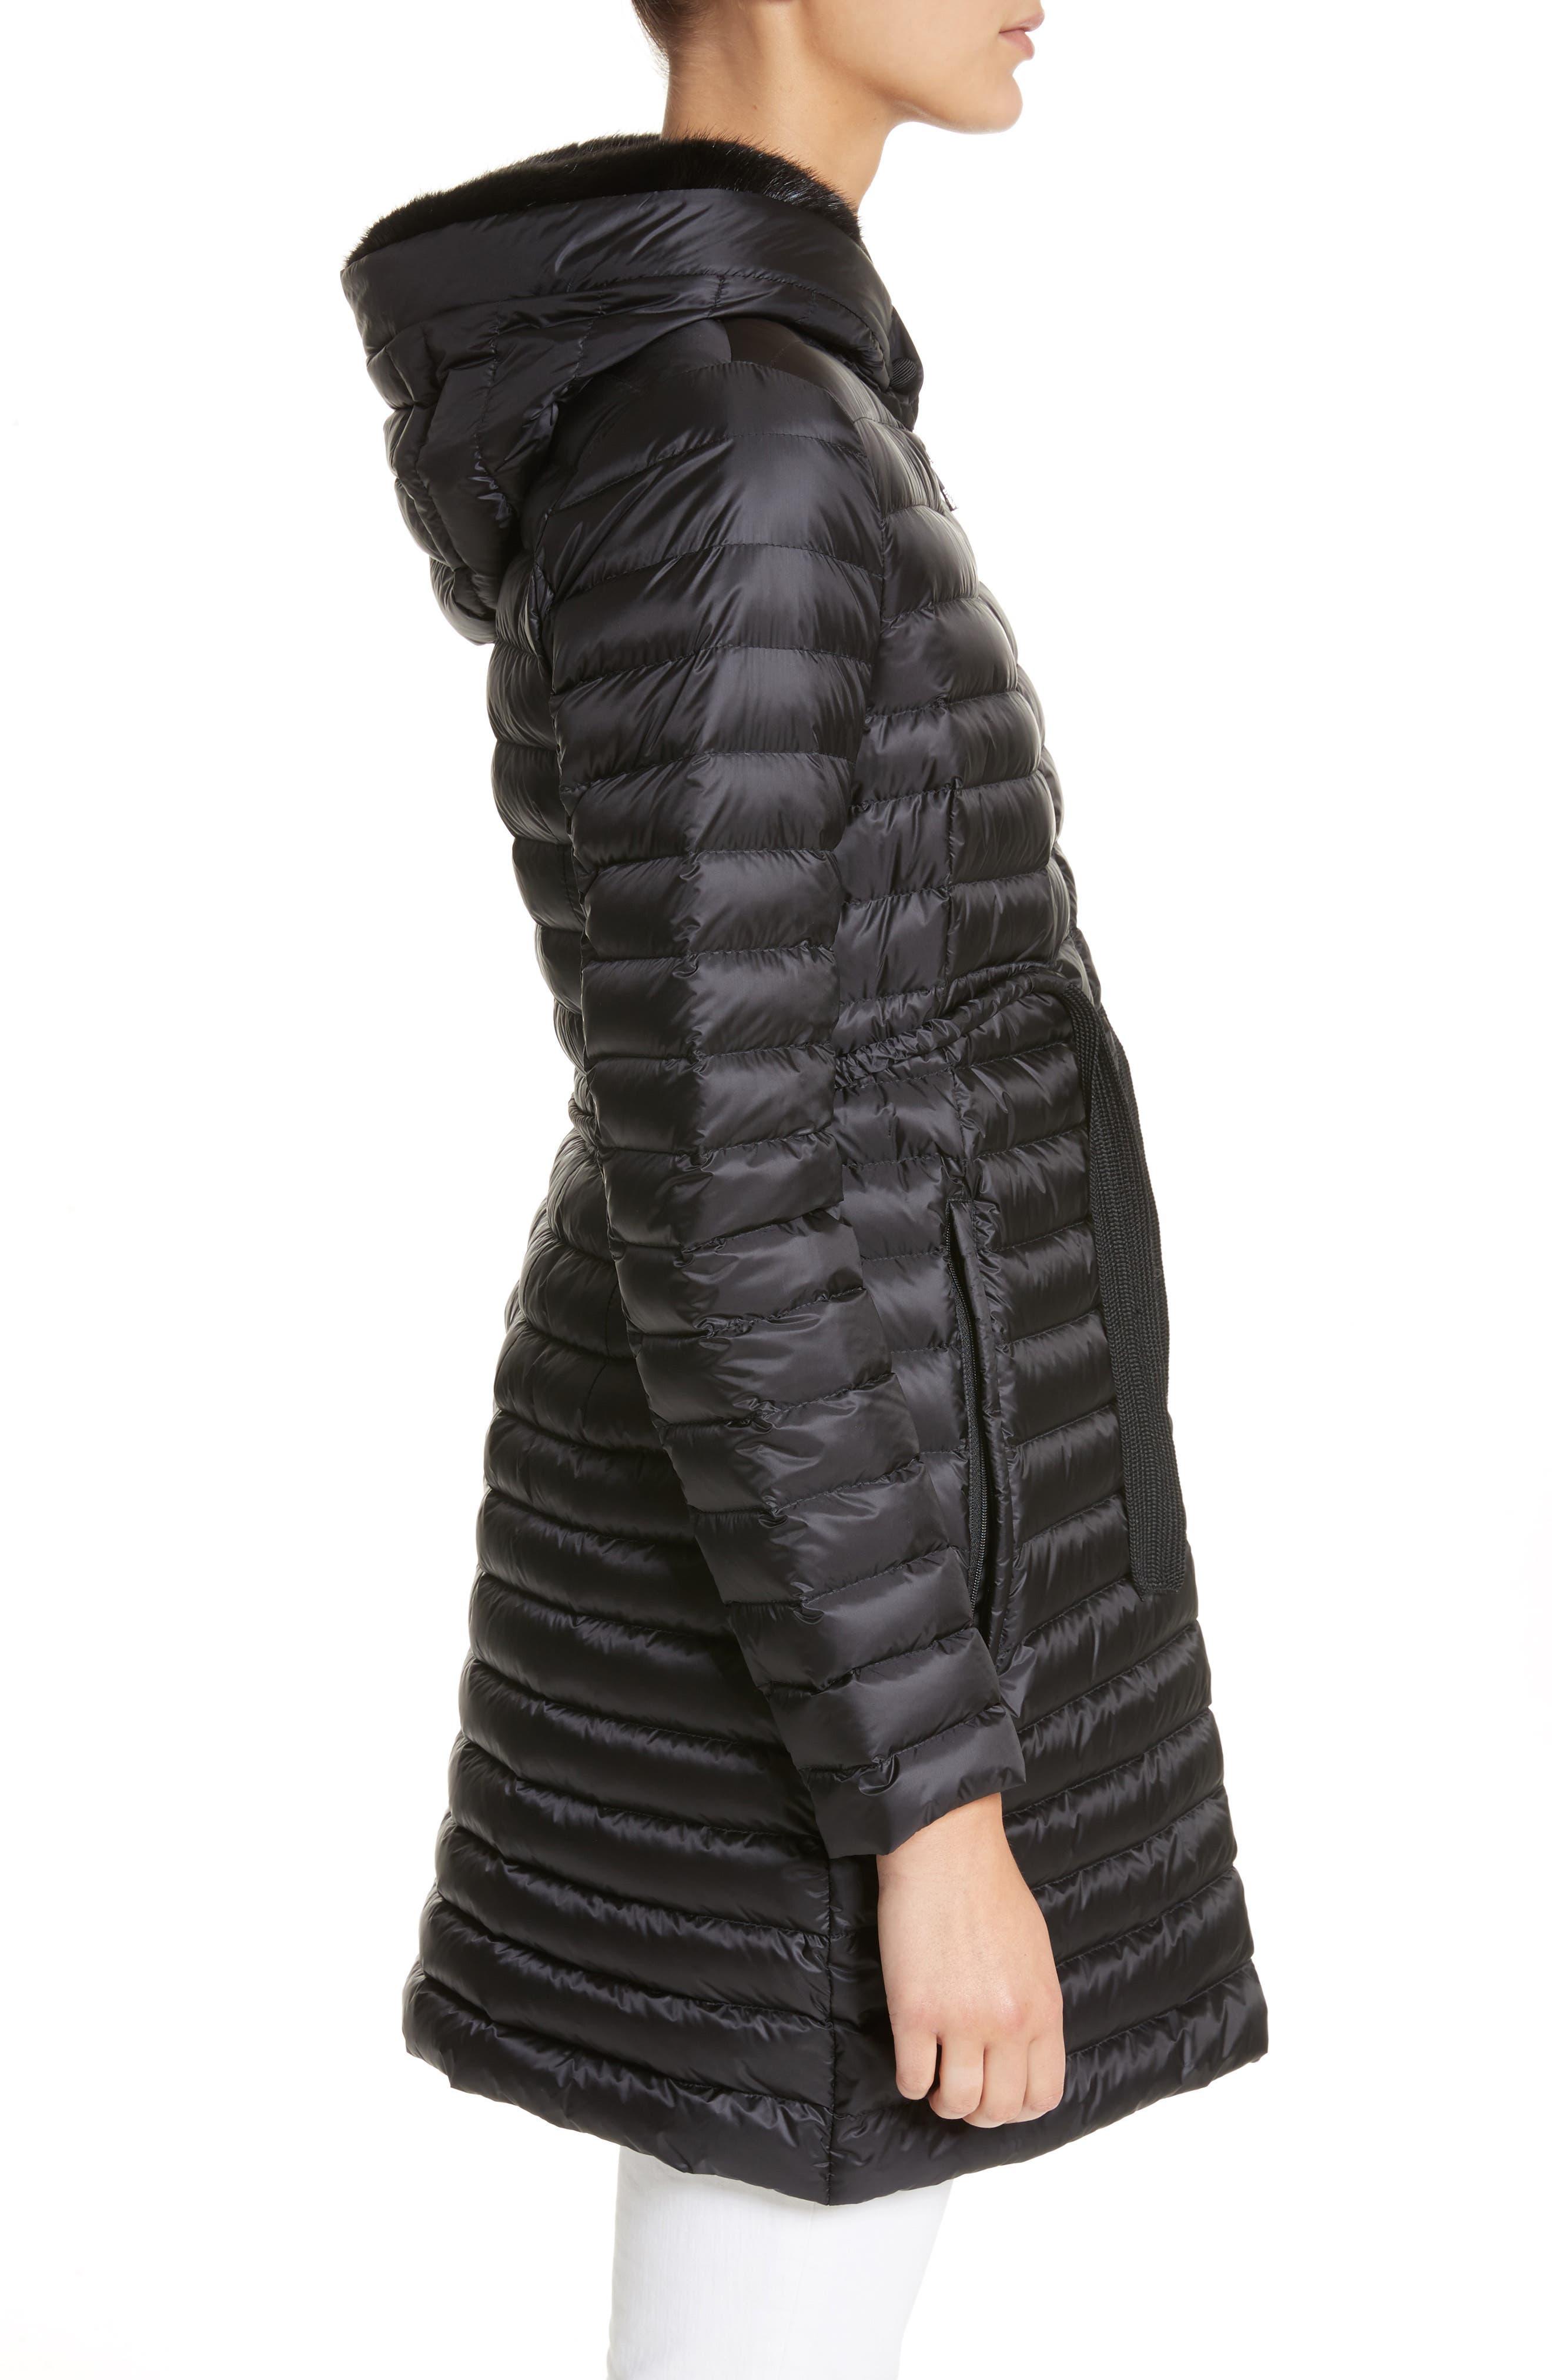 Barbel Hooded Down Coat with Genuine Mink Fur Trim,                             Alternate thumbnail 3, color,                             001